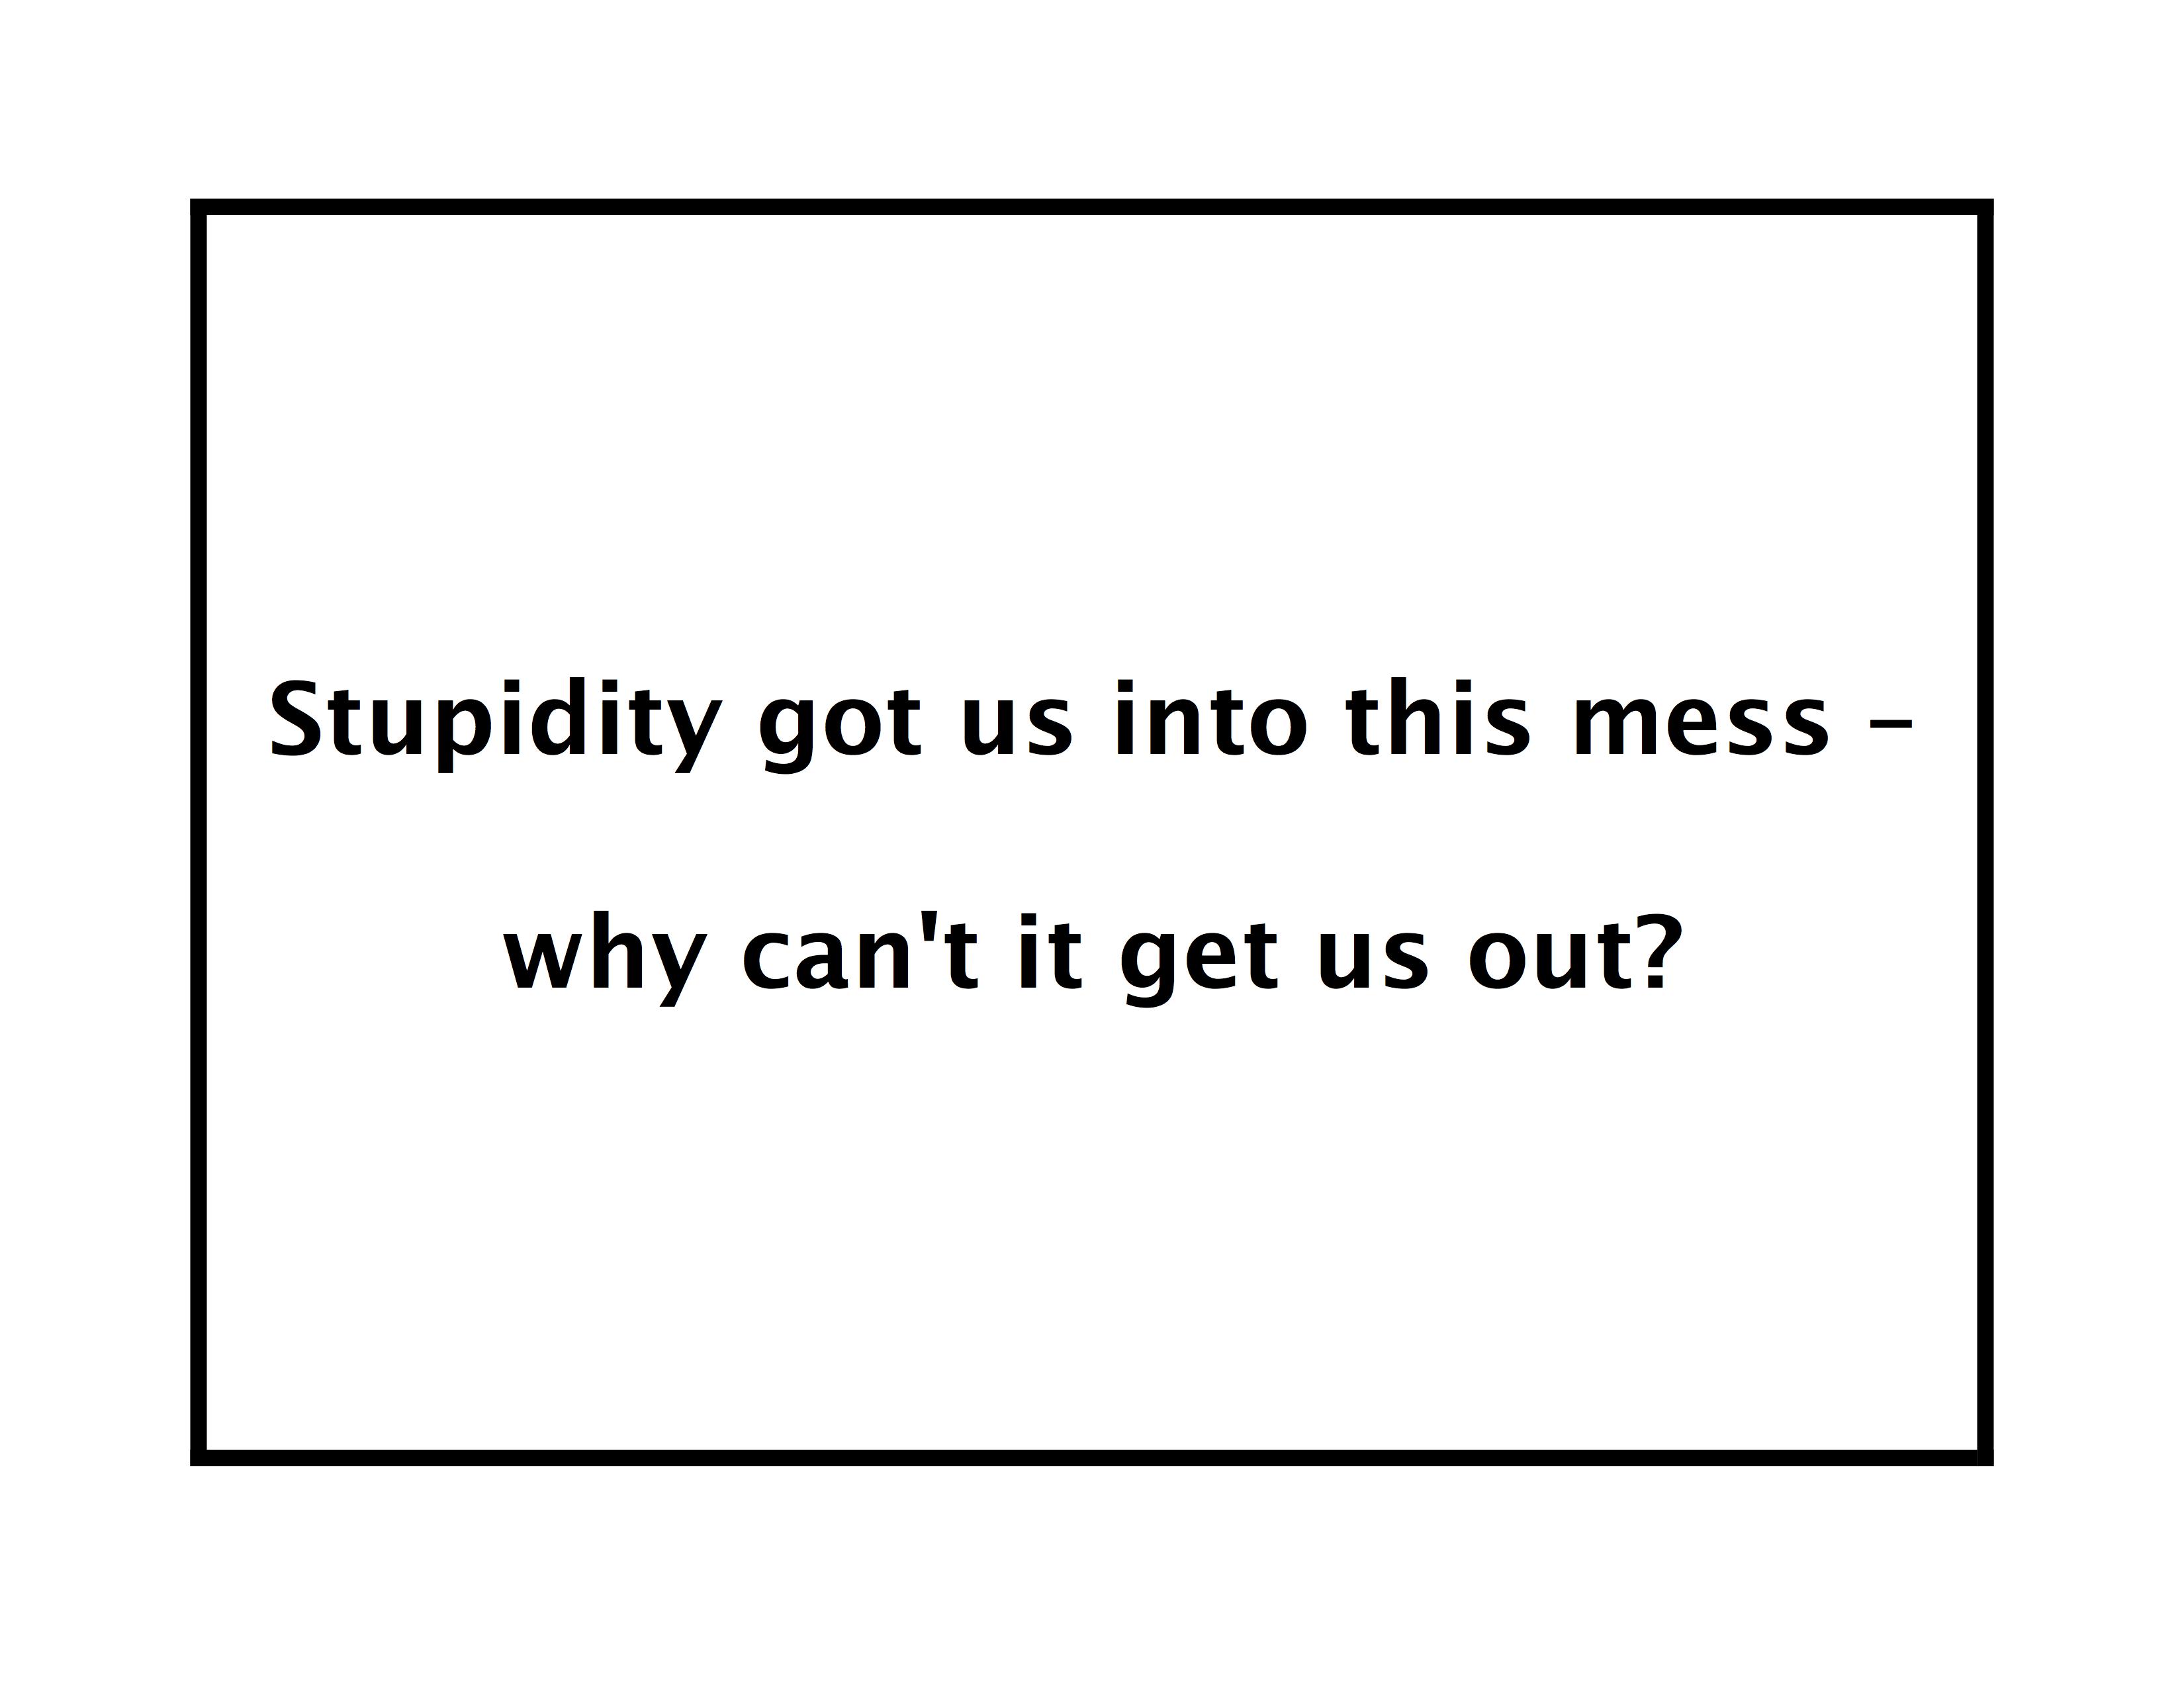 StupidityGotUsIntoThisMess